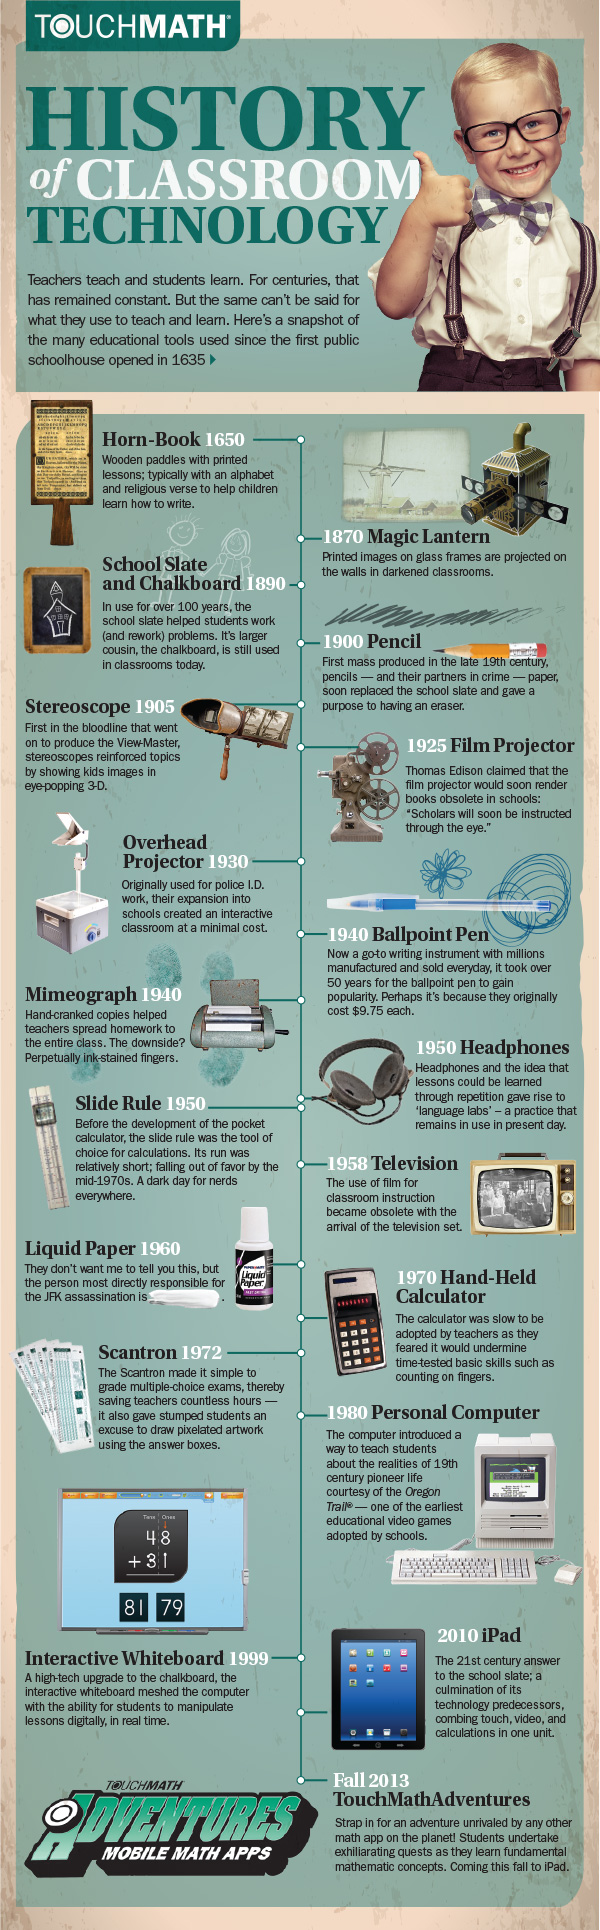 history-of-classroom-technology